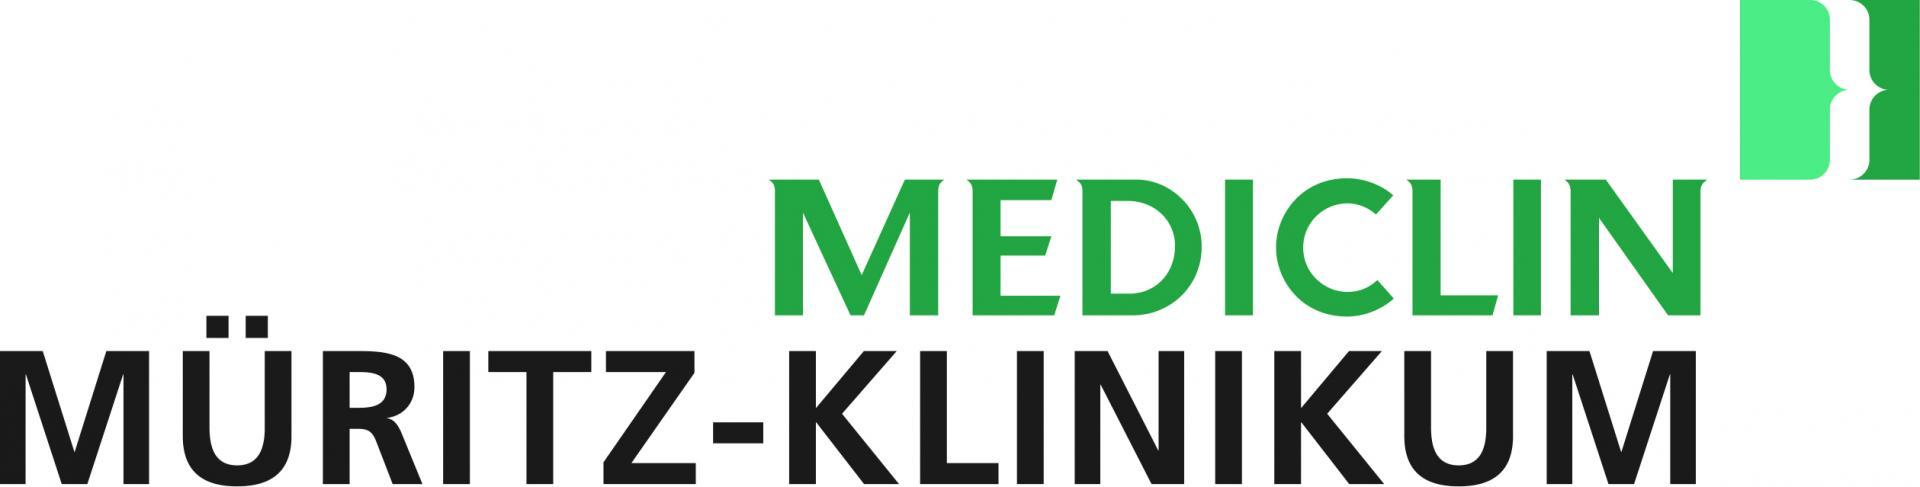 MediClin Müritz-Klinikum